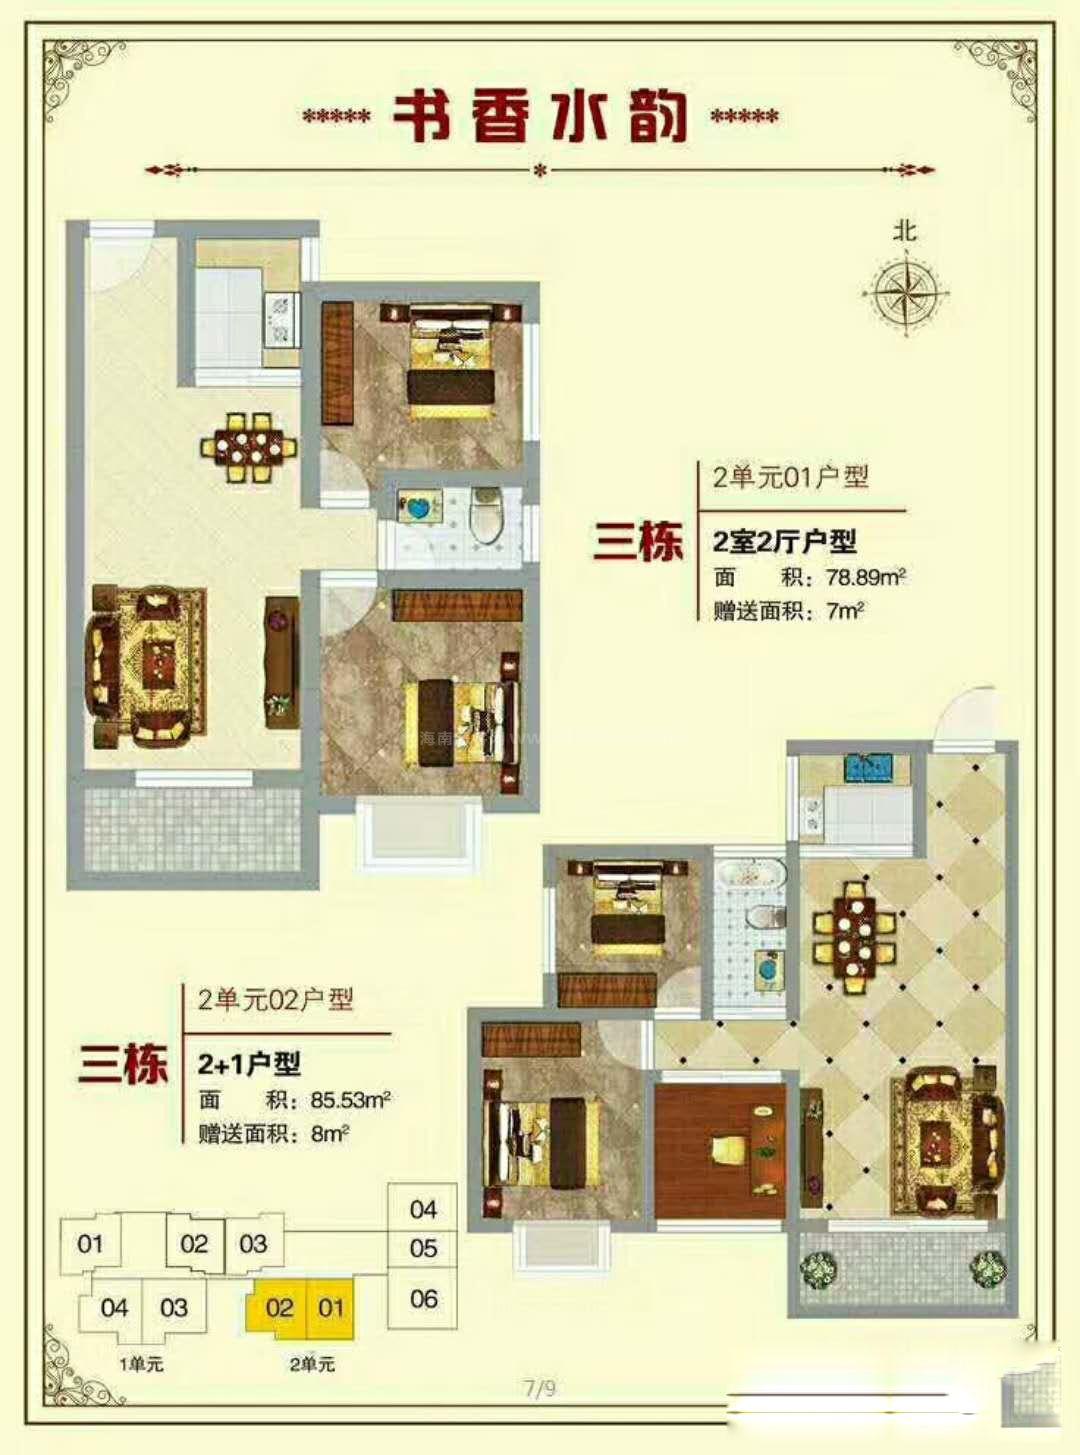 2室2厅 建面78.89平、3室2厅 建面85.53平